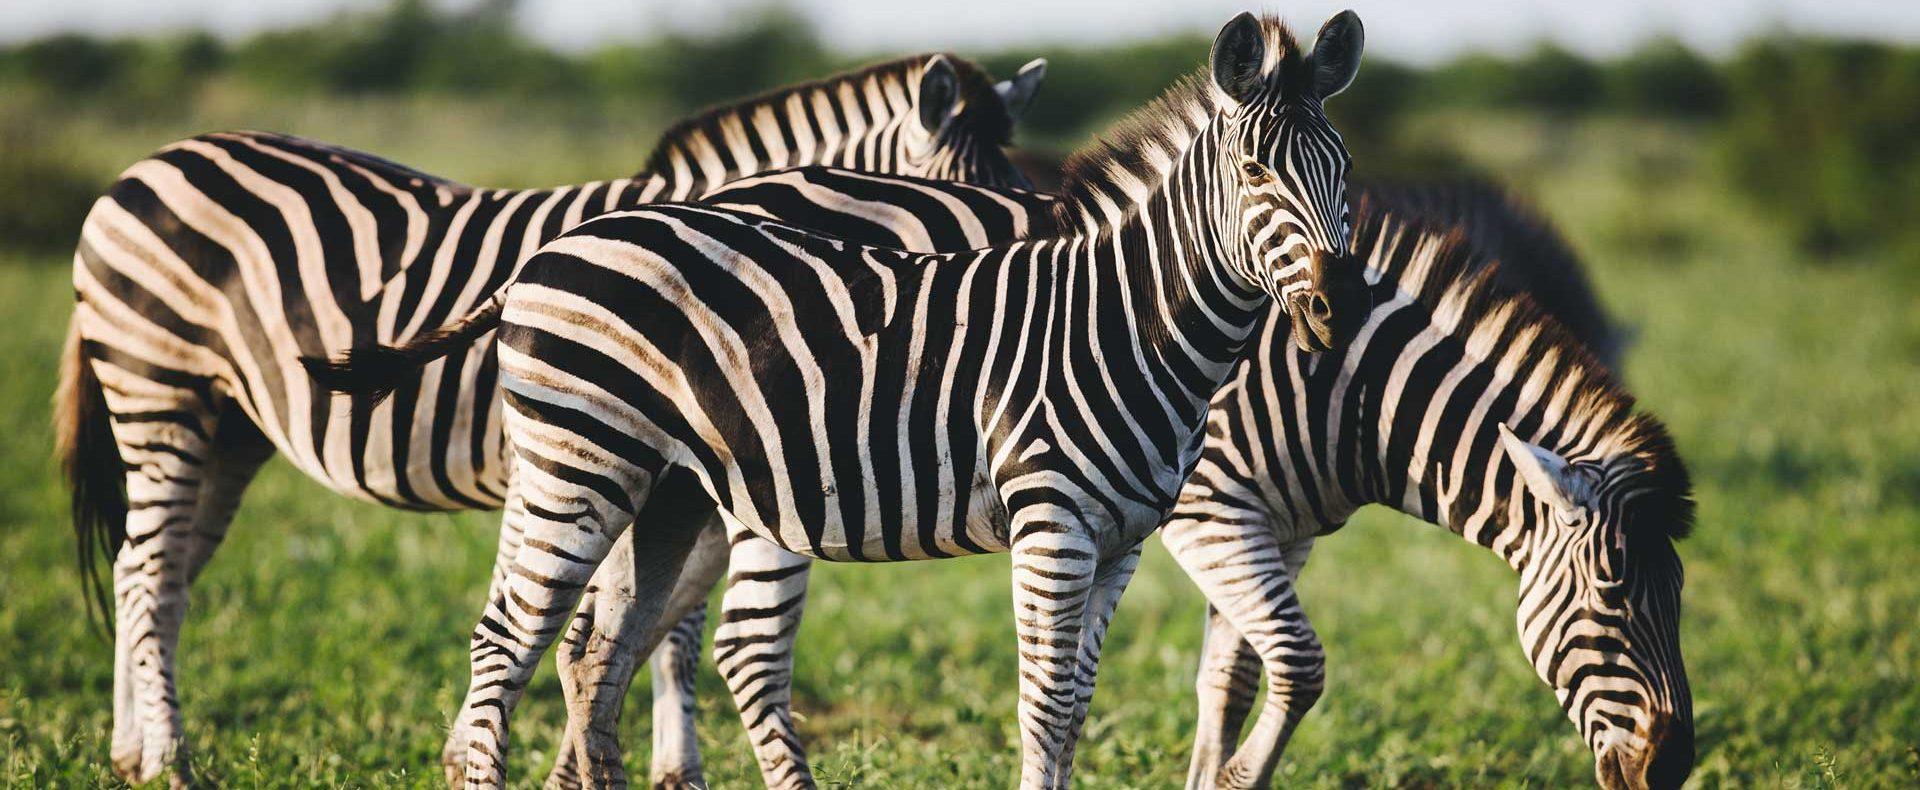 three-common-zebras-foraging-on-savanna-Z45GP7M.jpg